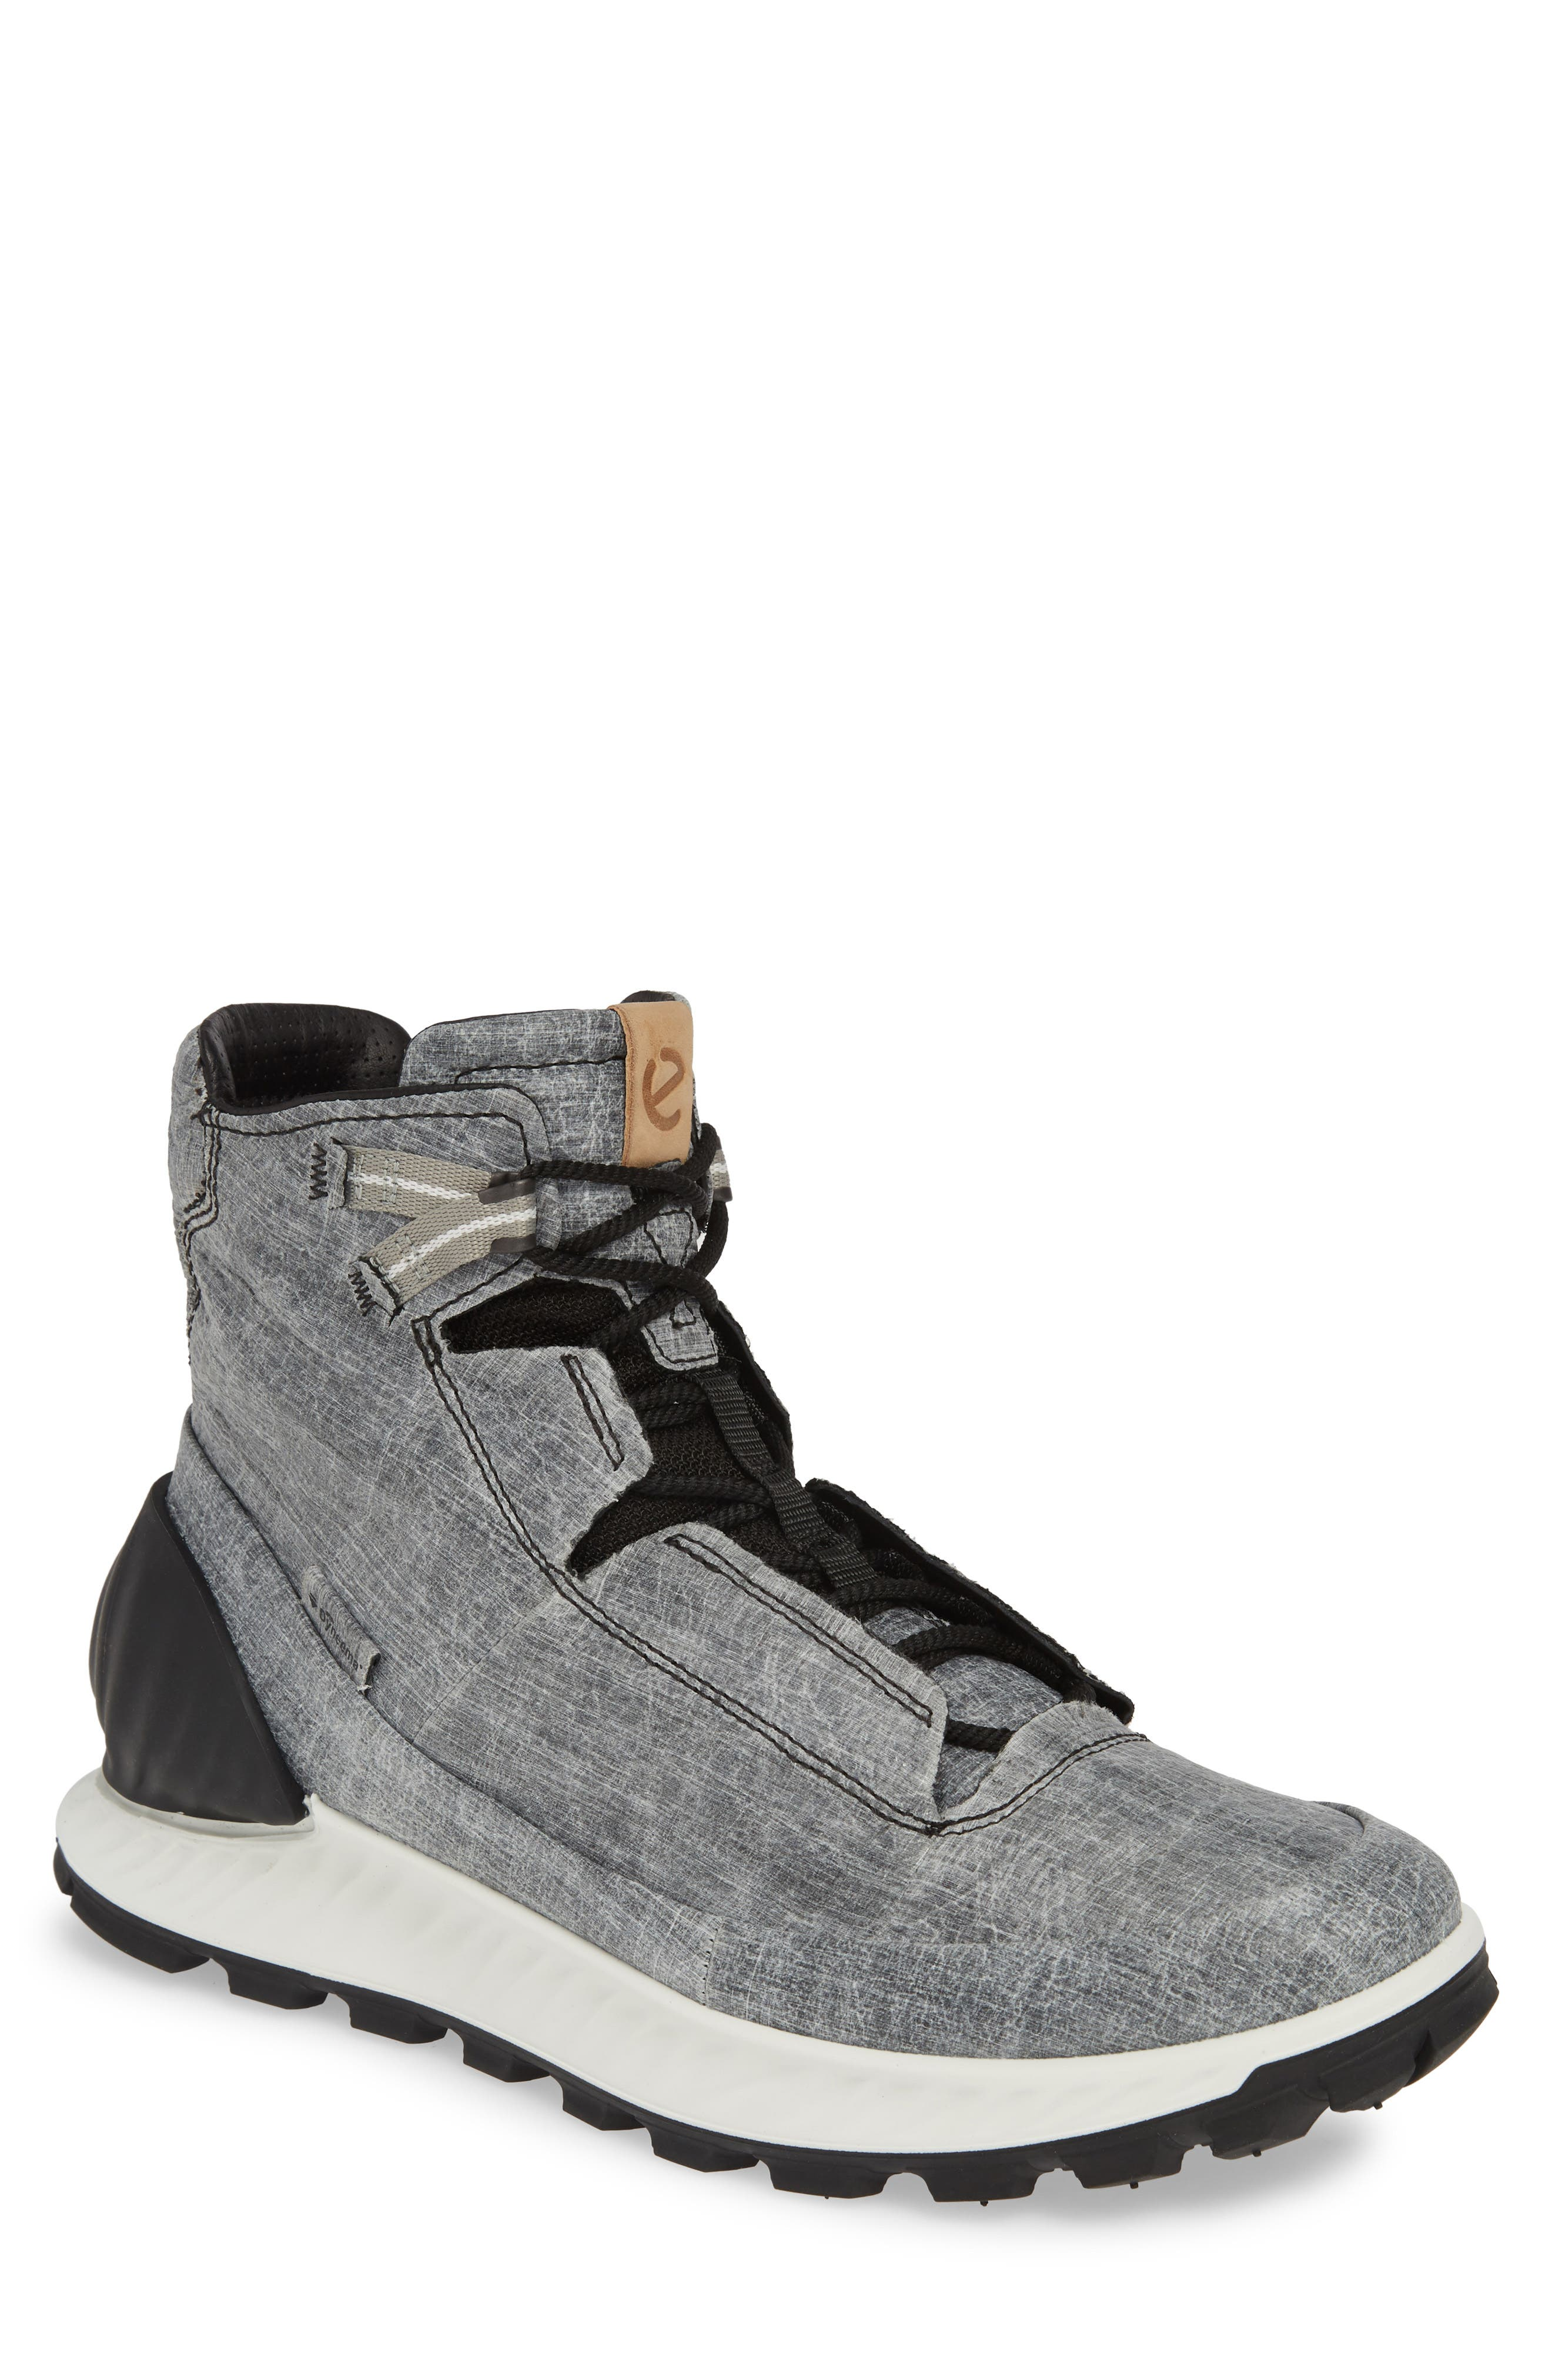 Ecco Limited Edition Exostrike Dyneema Sneaker Boot, Grey